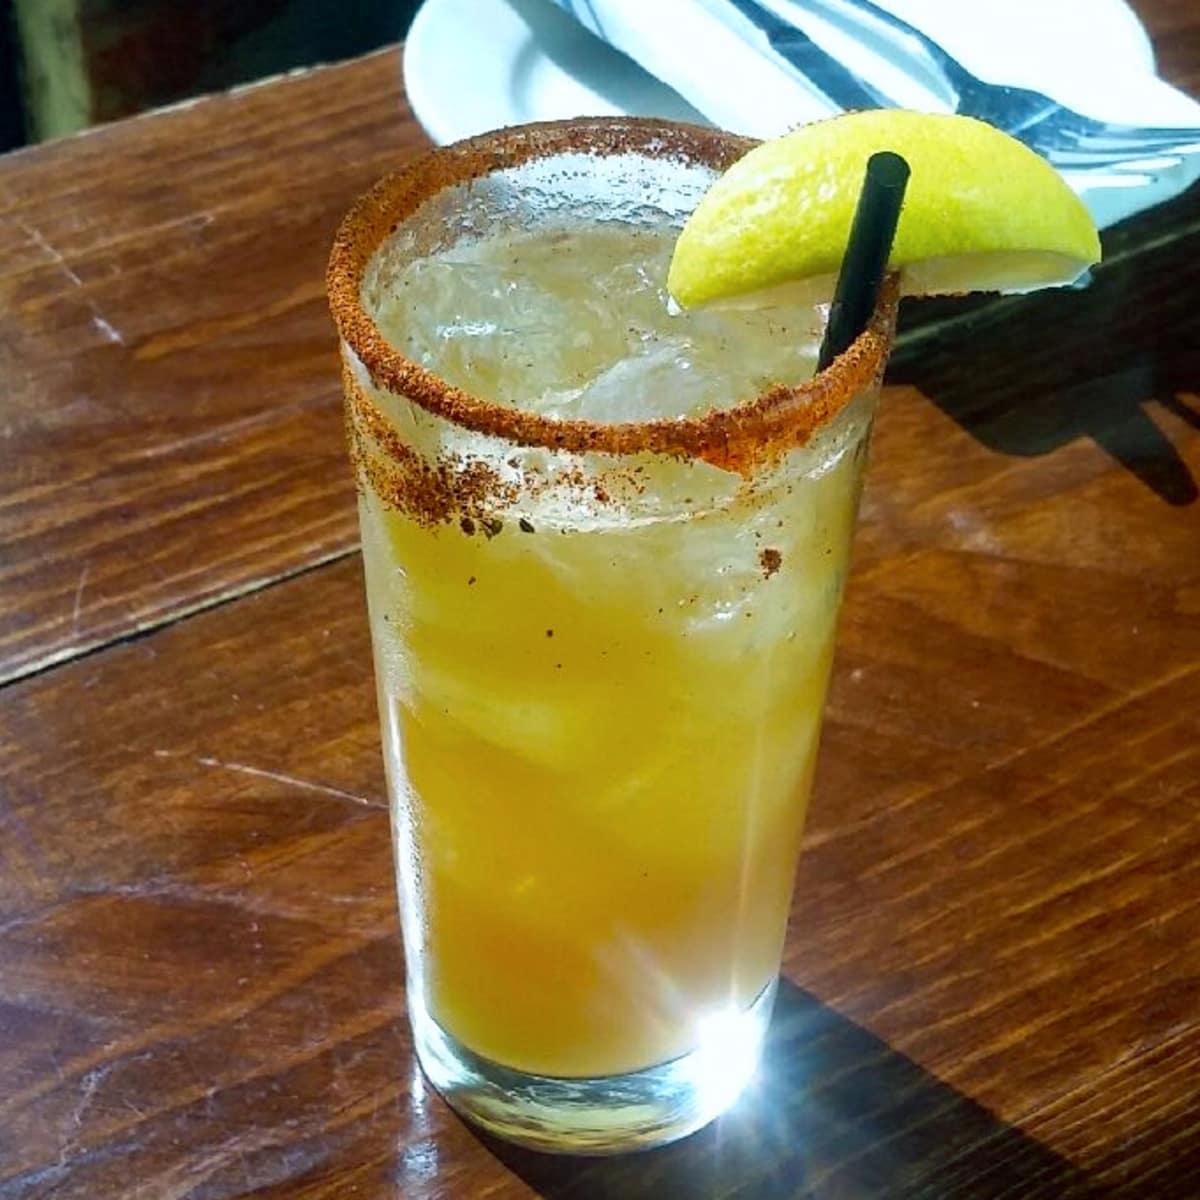 Houston, Southern Goods, Cajun Lemonade, August 2017